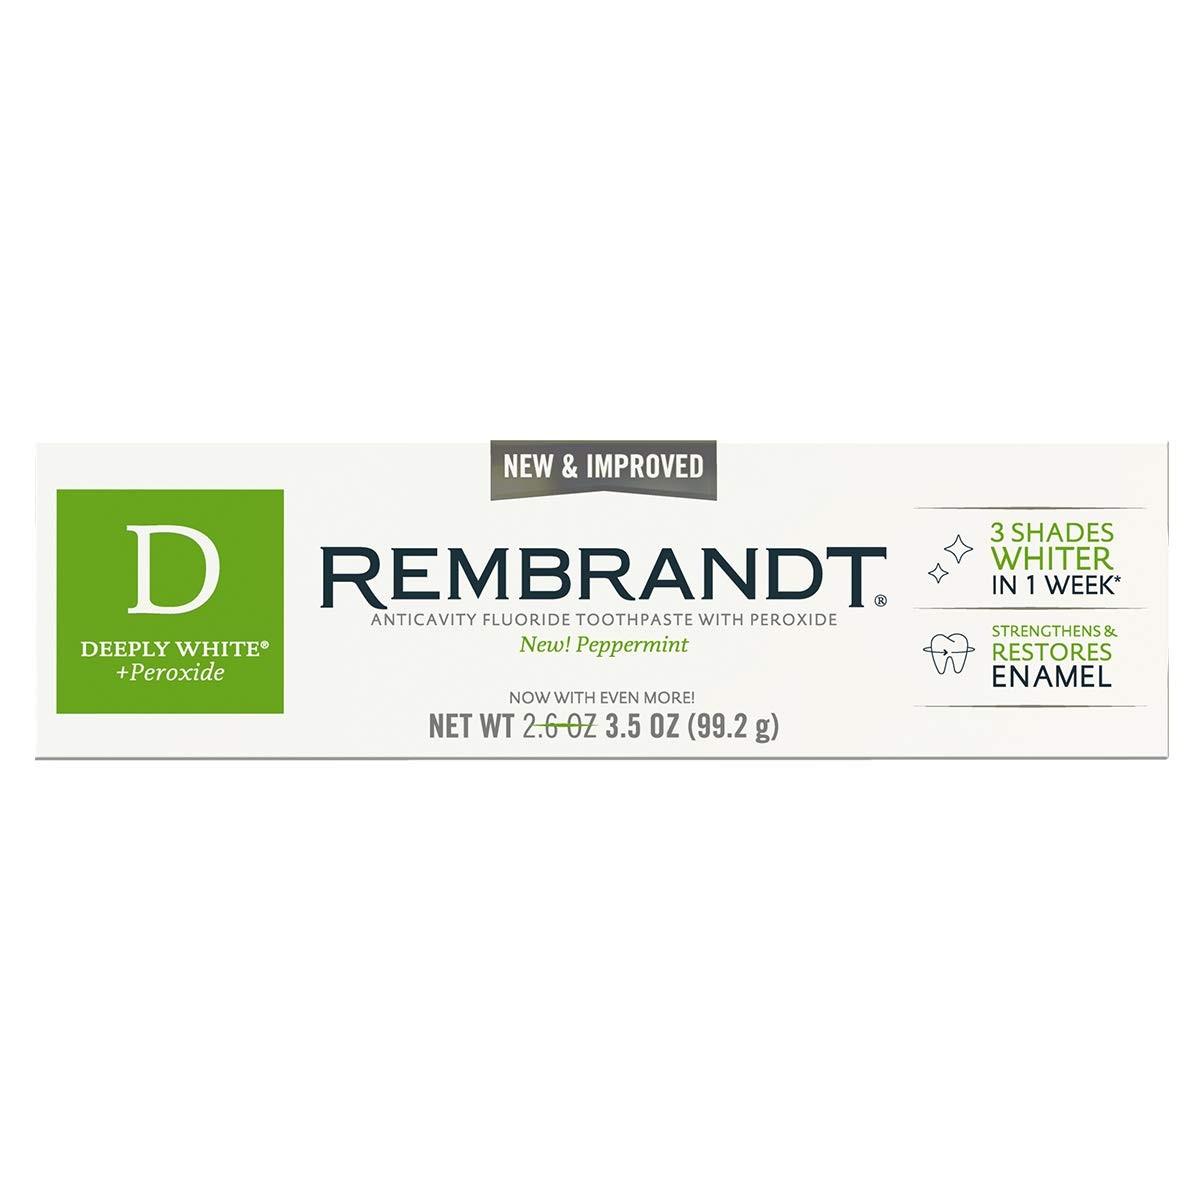 Зубная паста Deeply White Peppermint Rembrandt USA 1 шт(р) — фото №1